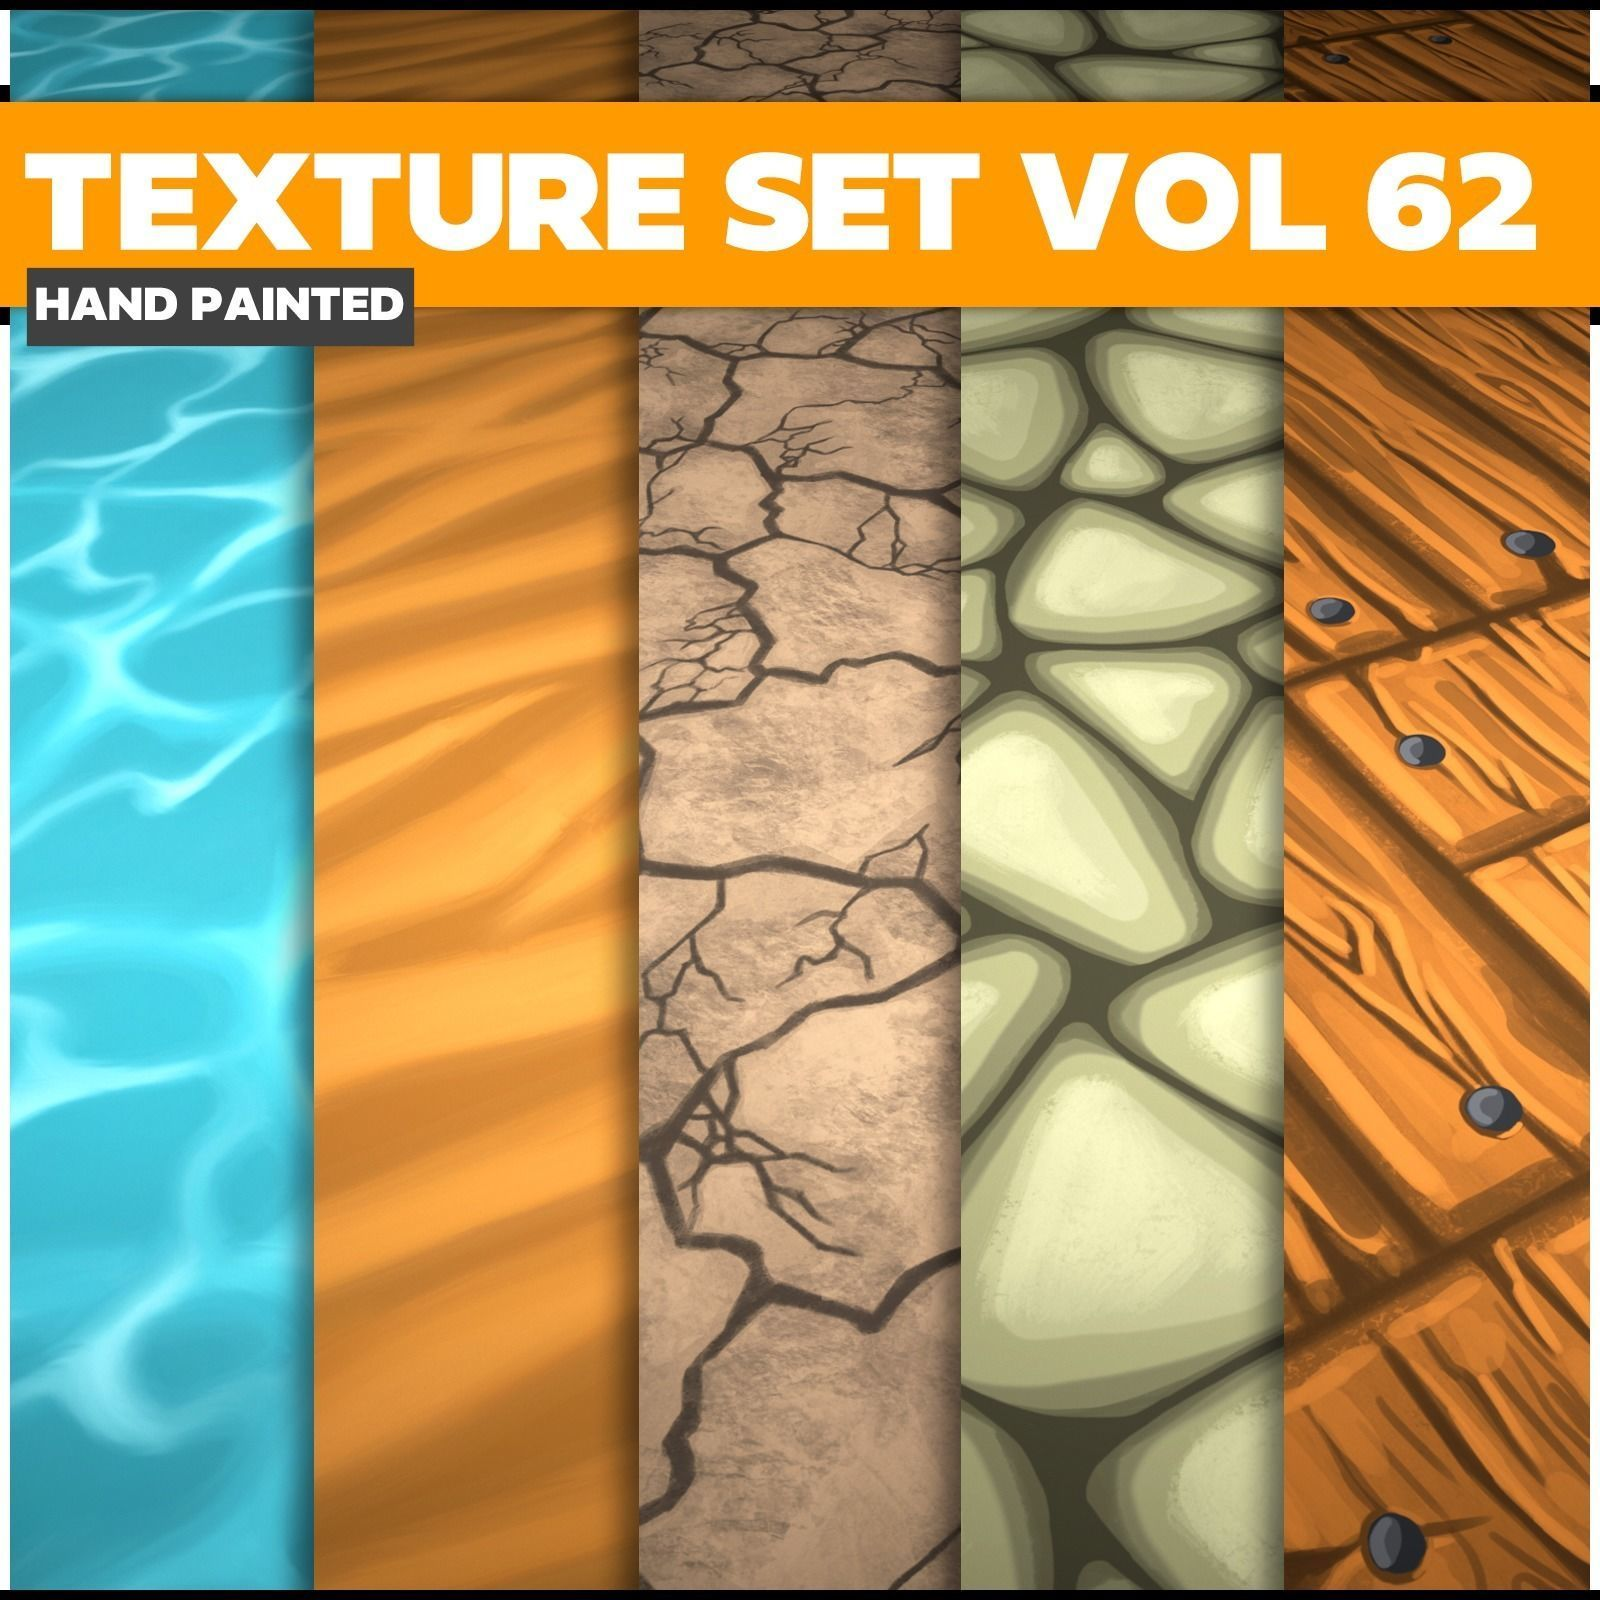 Terrain  Vol 62  - Game PBR Textures